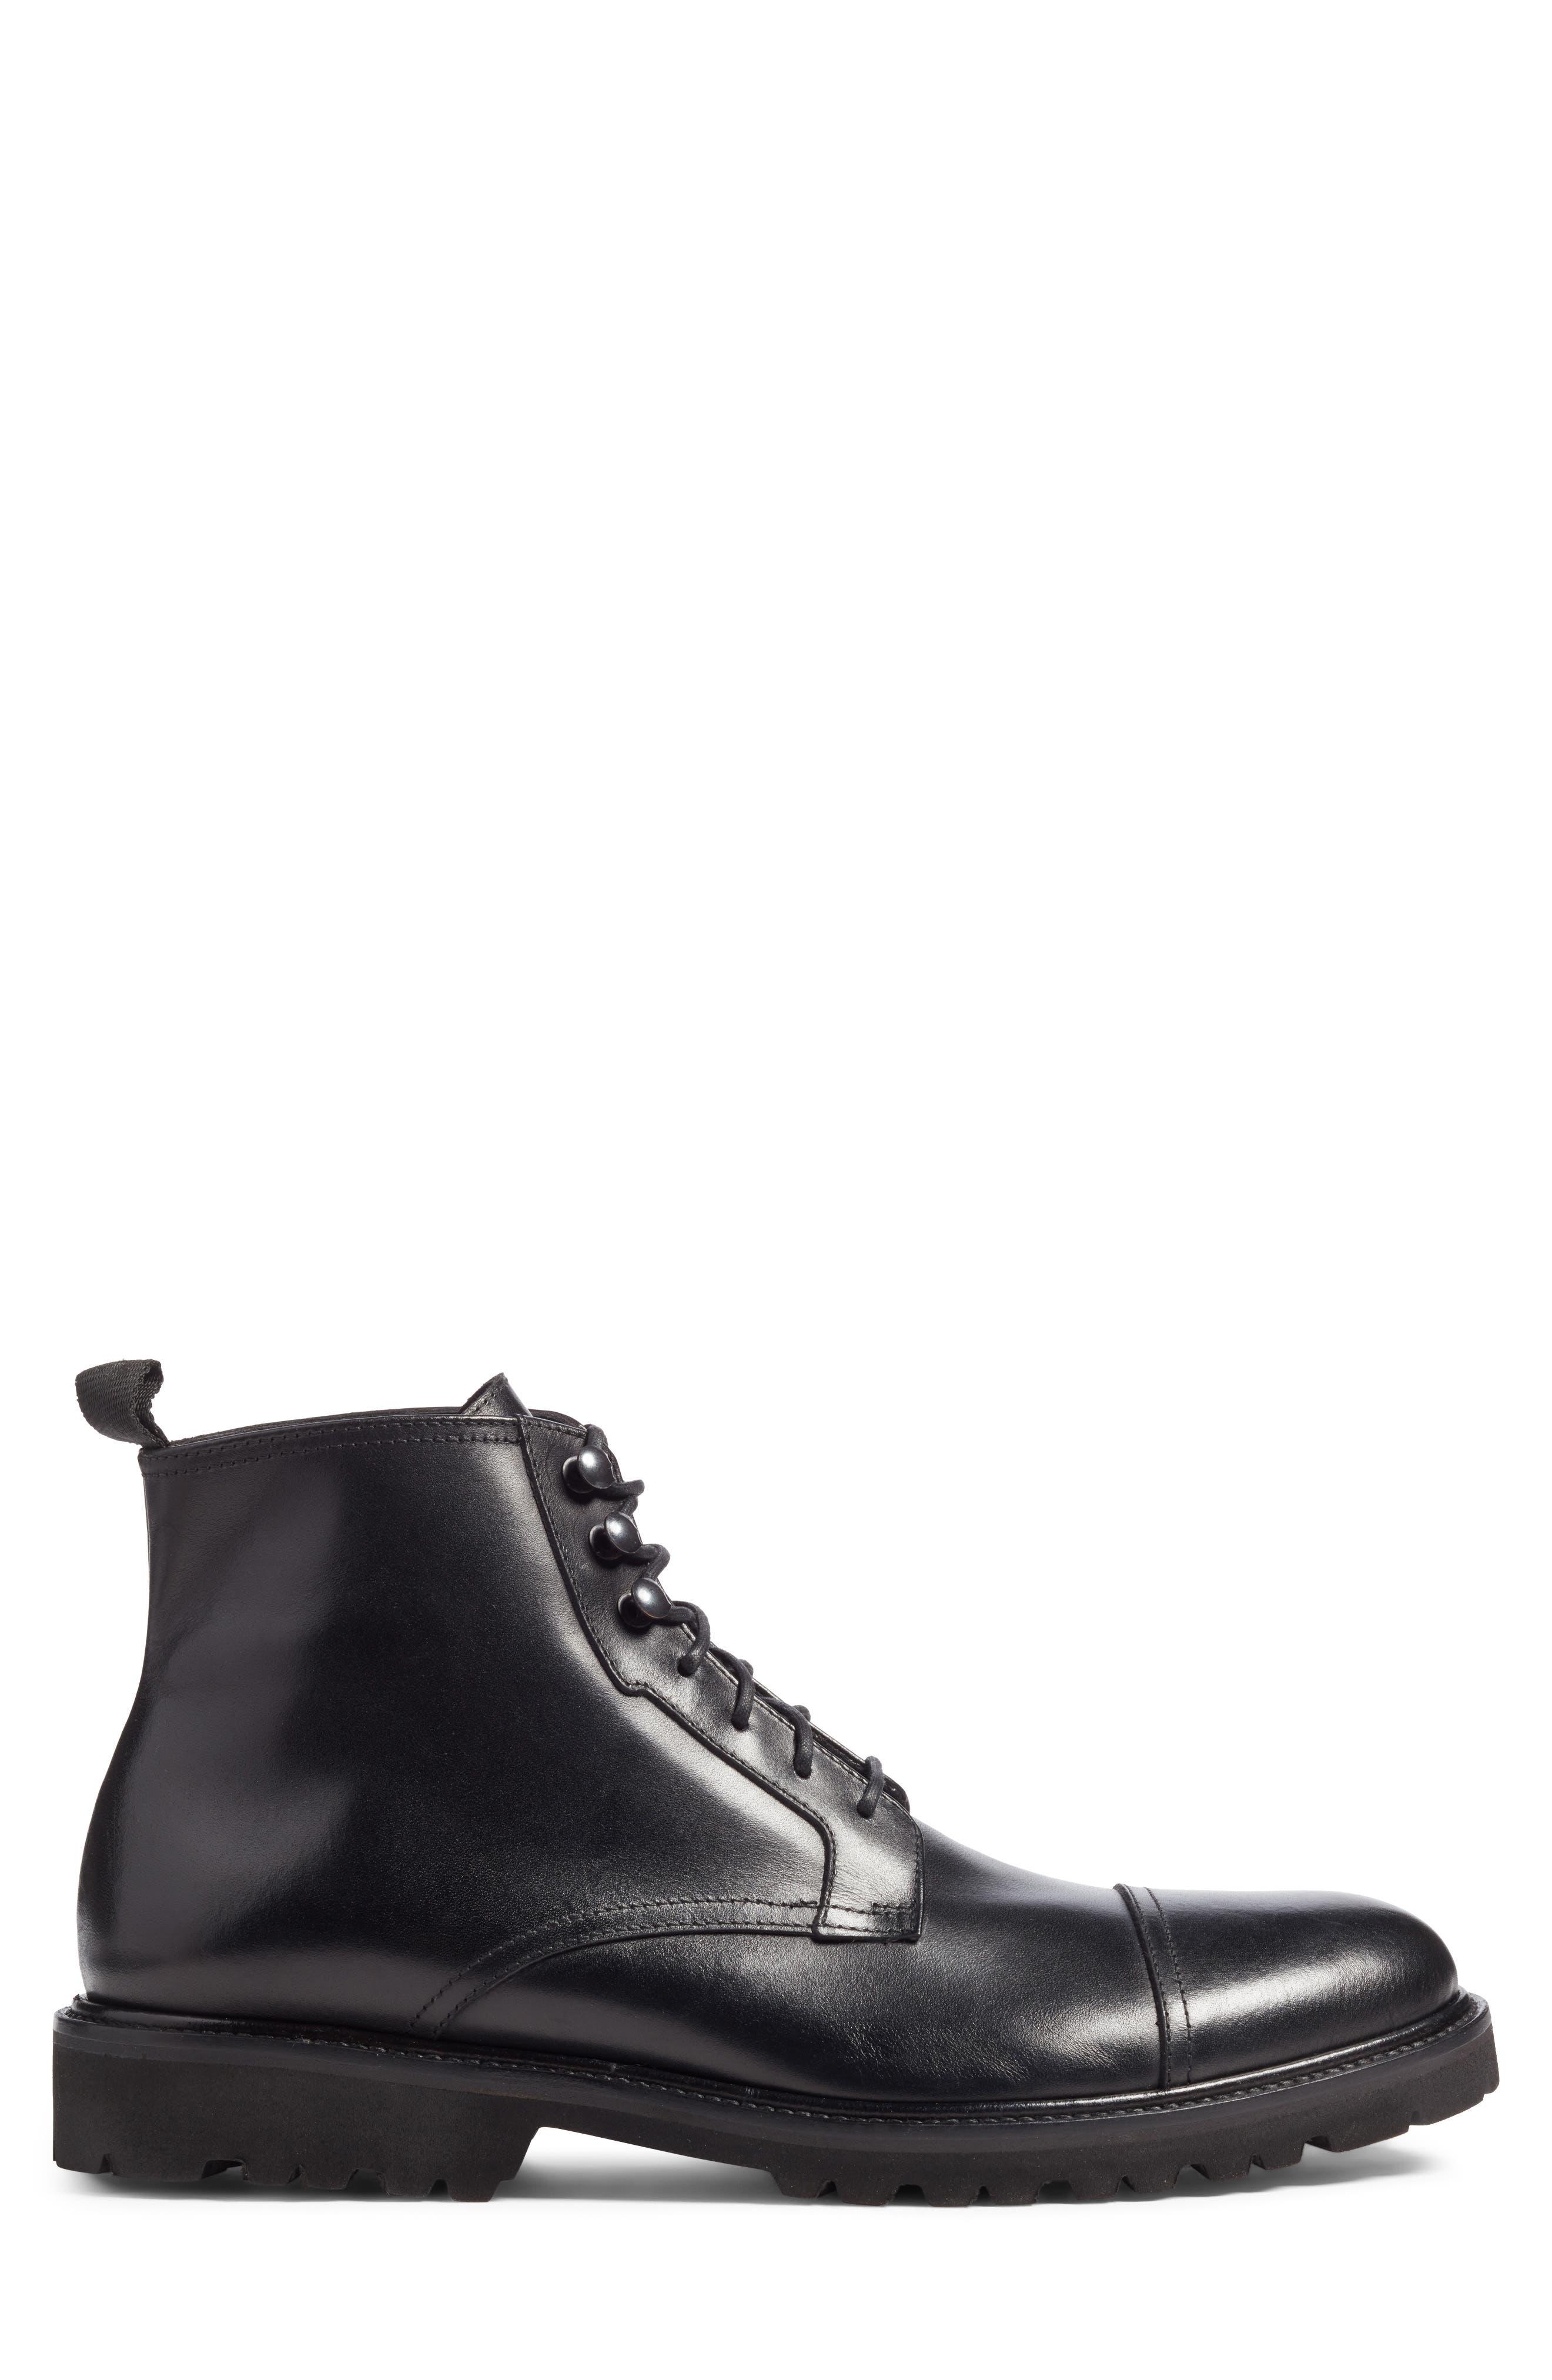 Alternate Image 3  - Monte Rosso Tropea Waterproof Cap Toe Boot (Men)